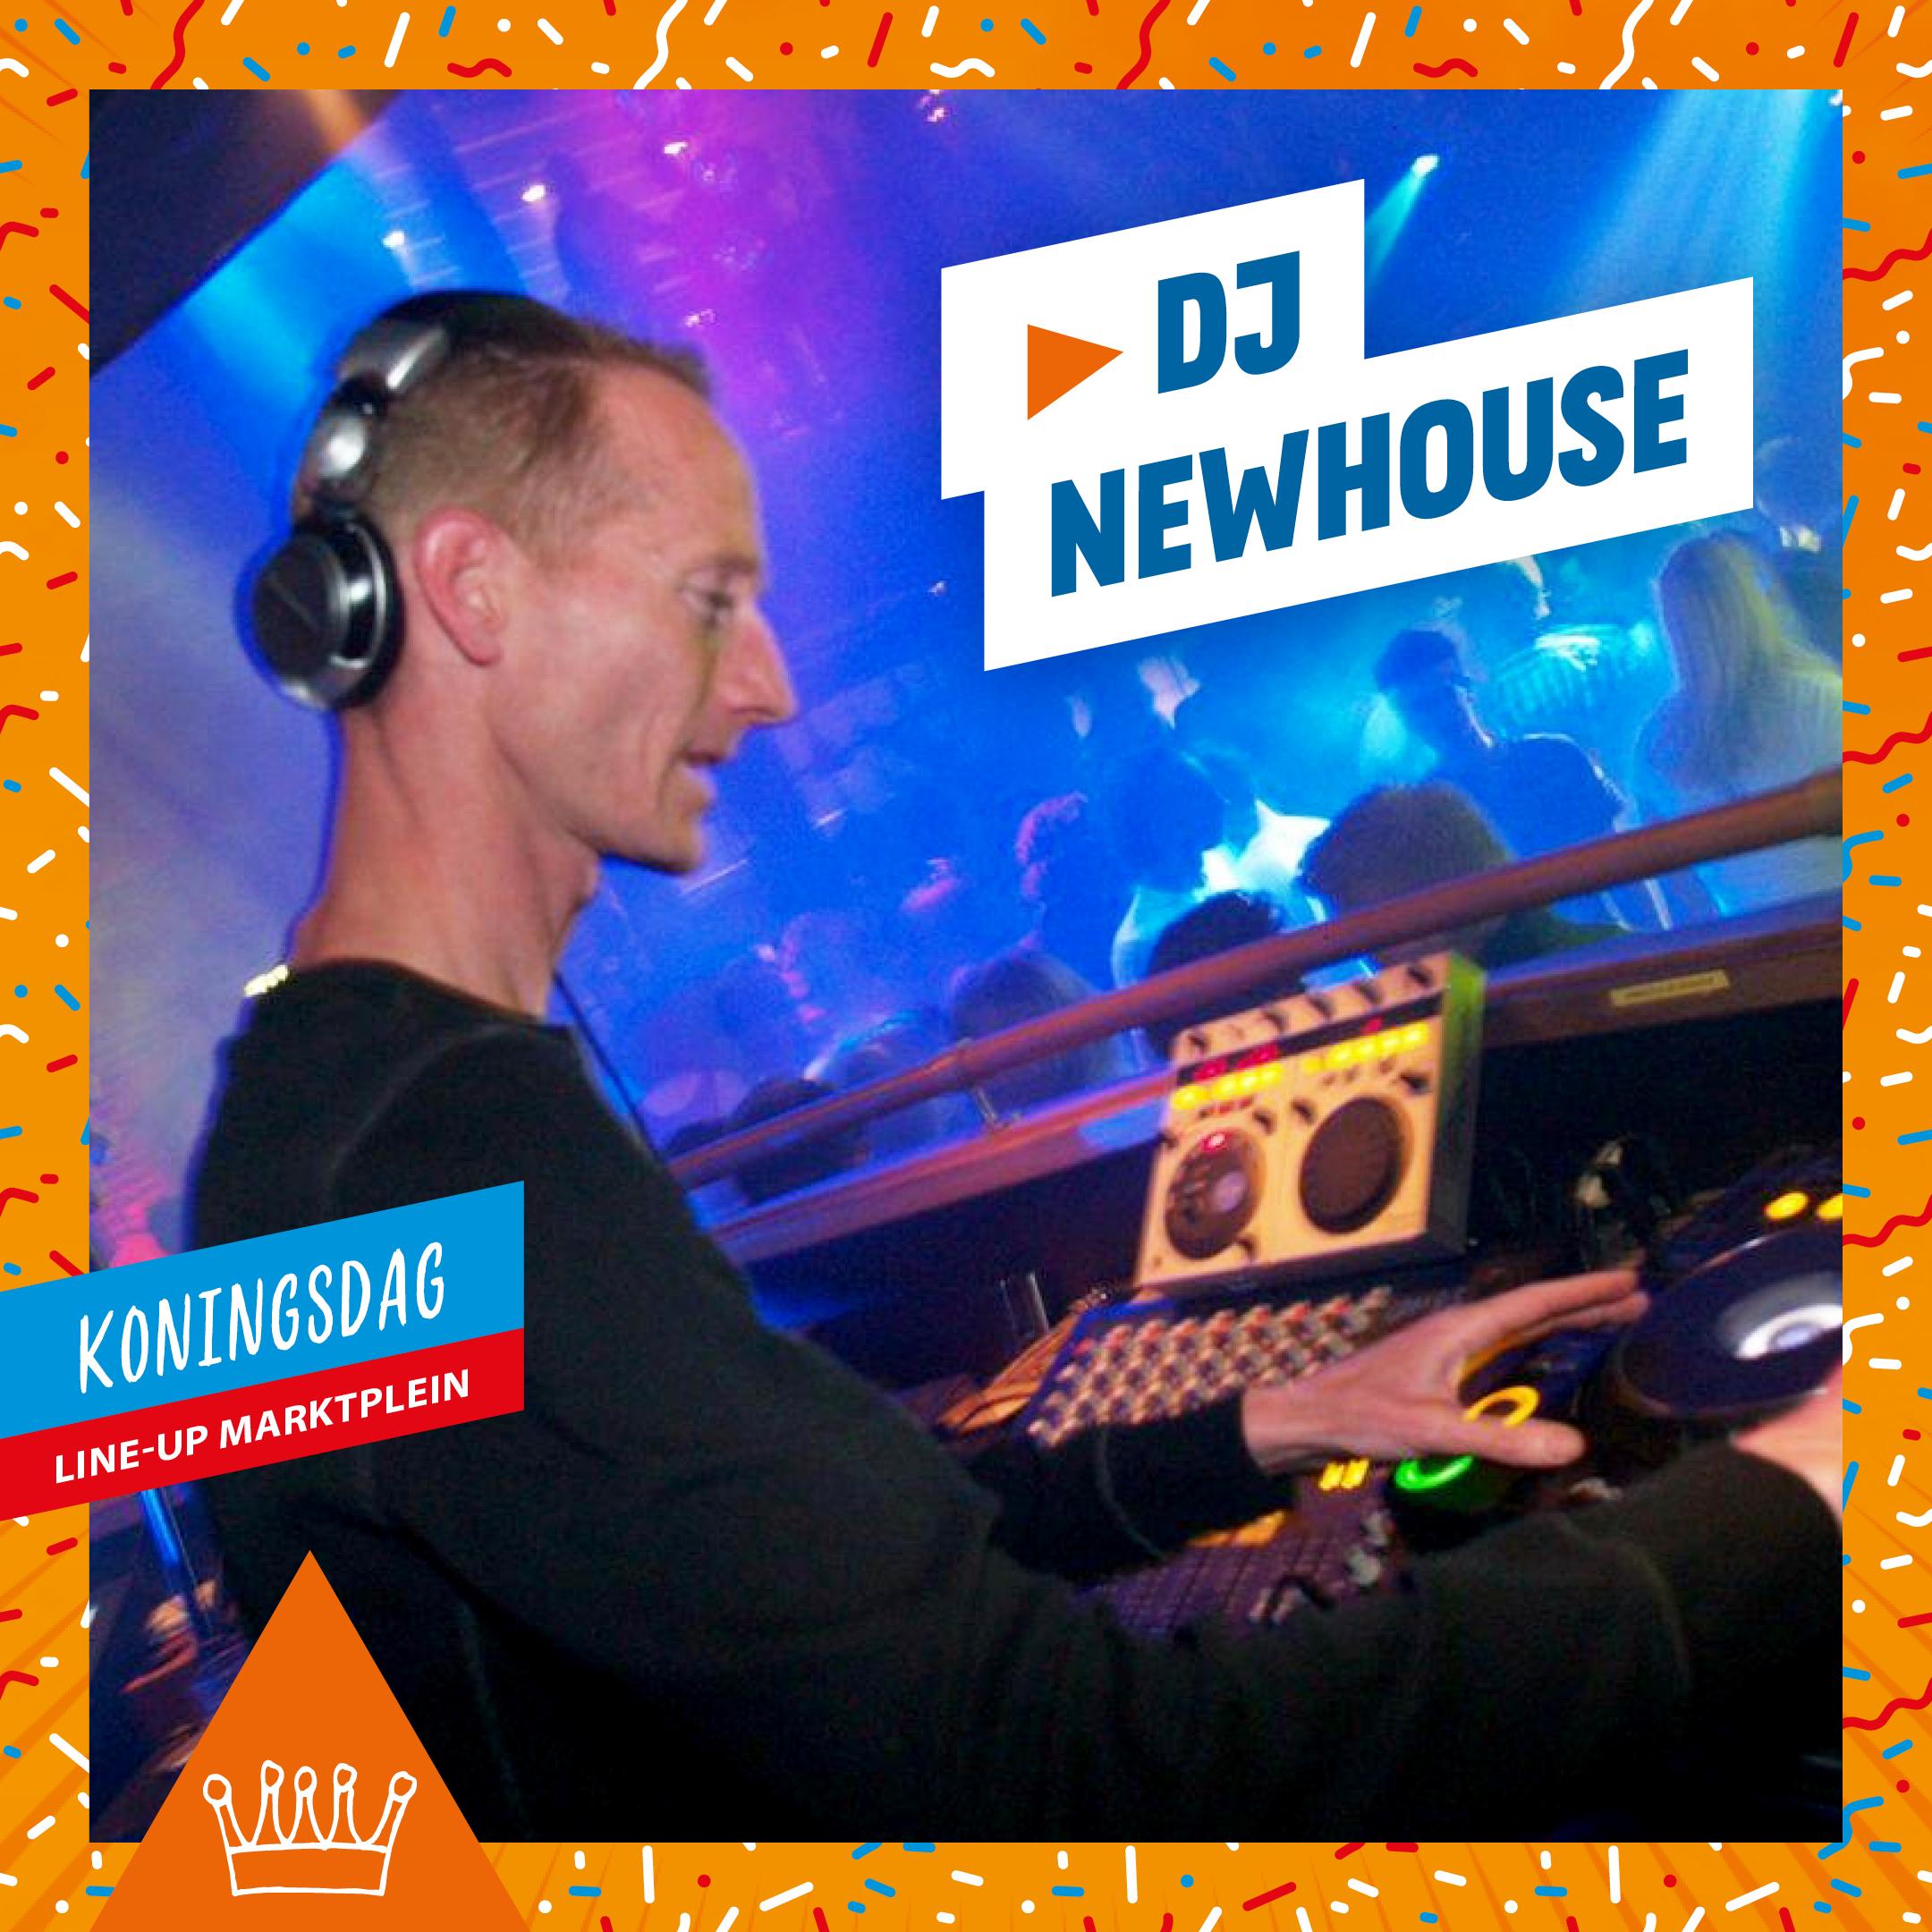 DJ Newhouse